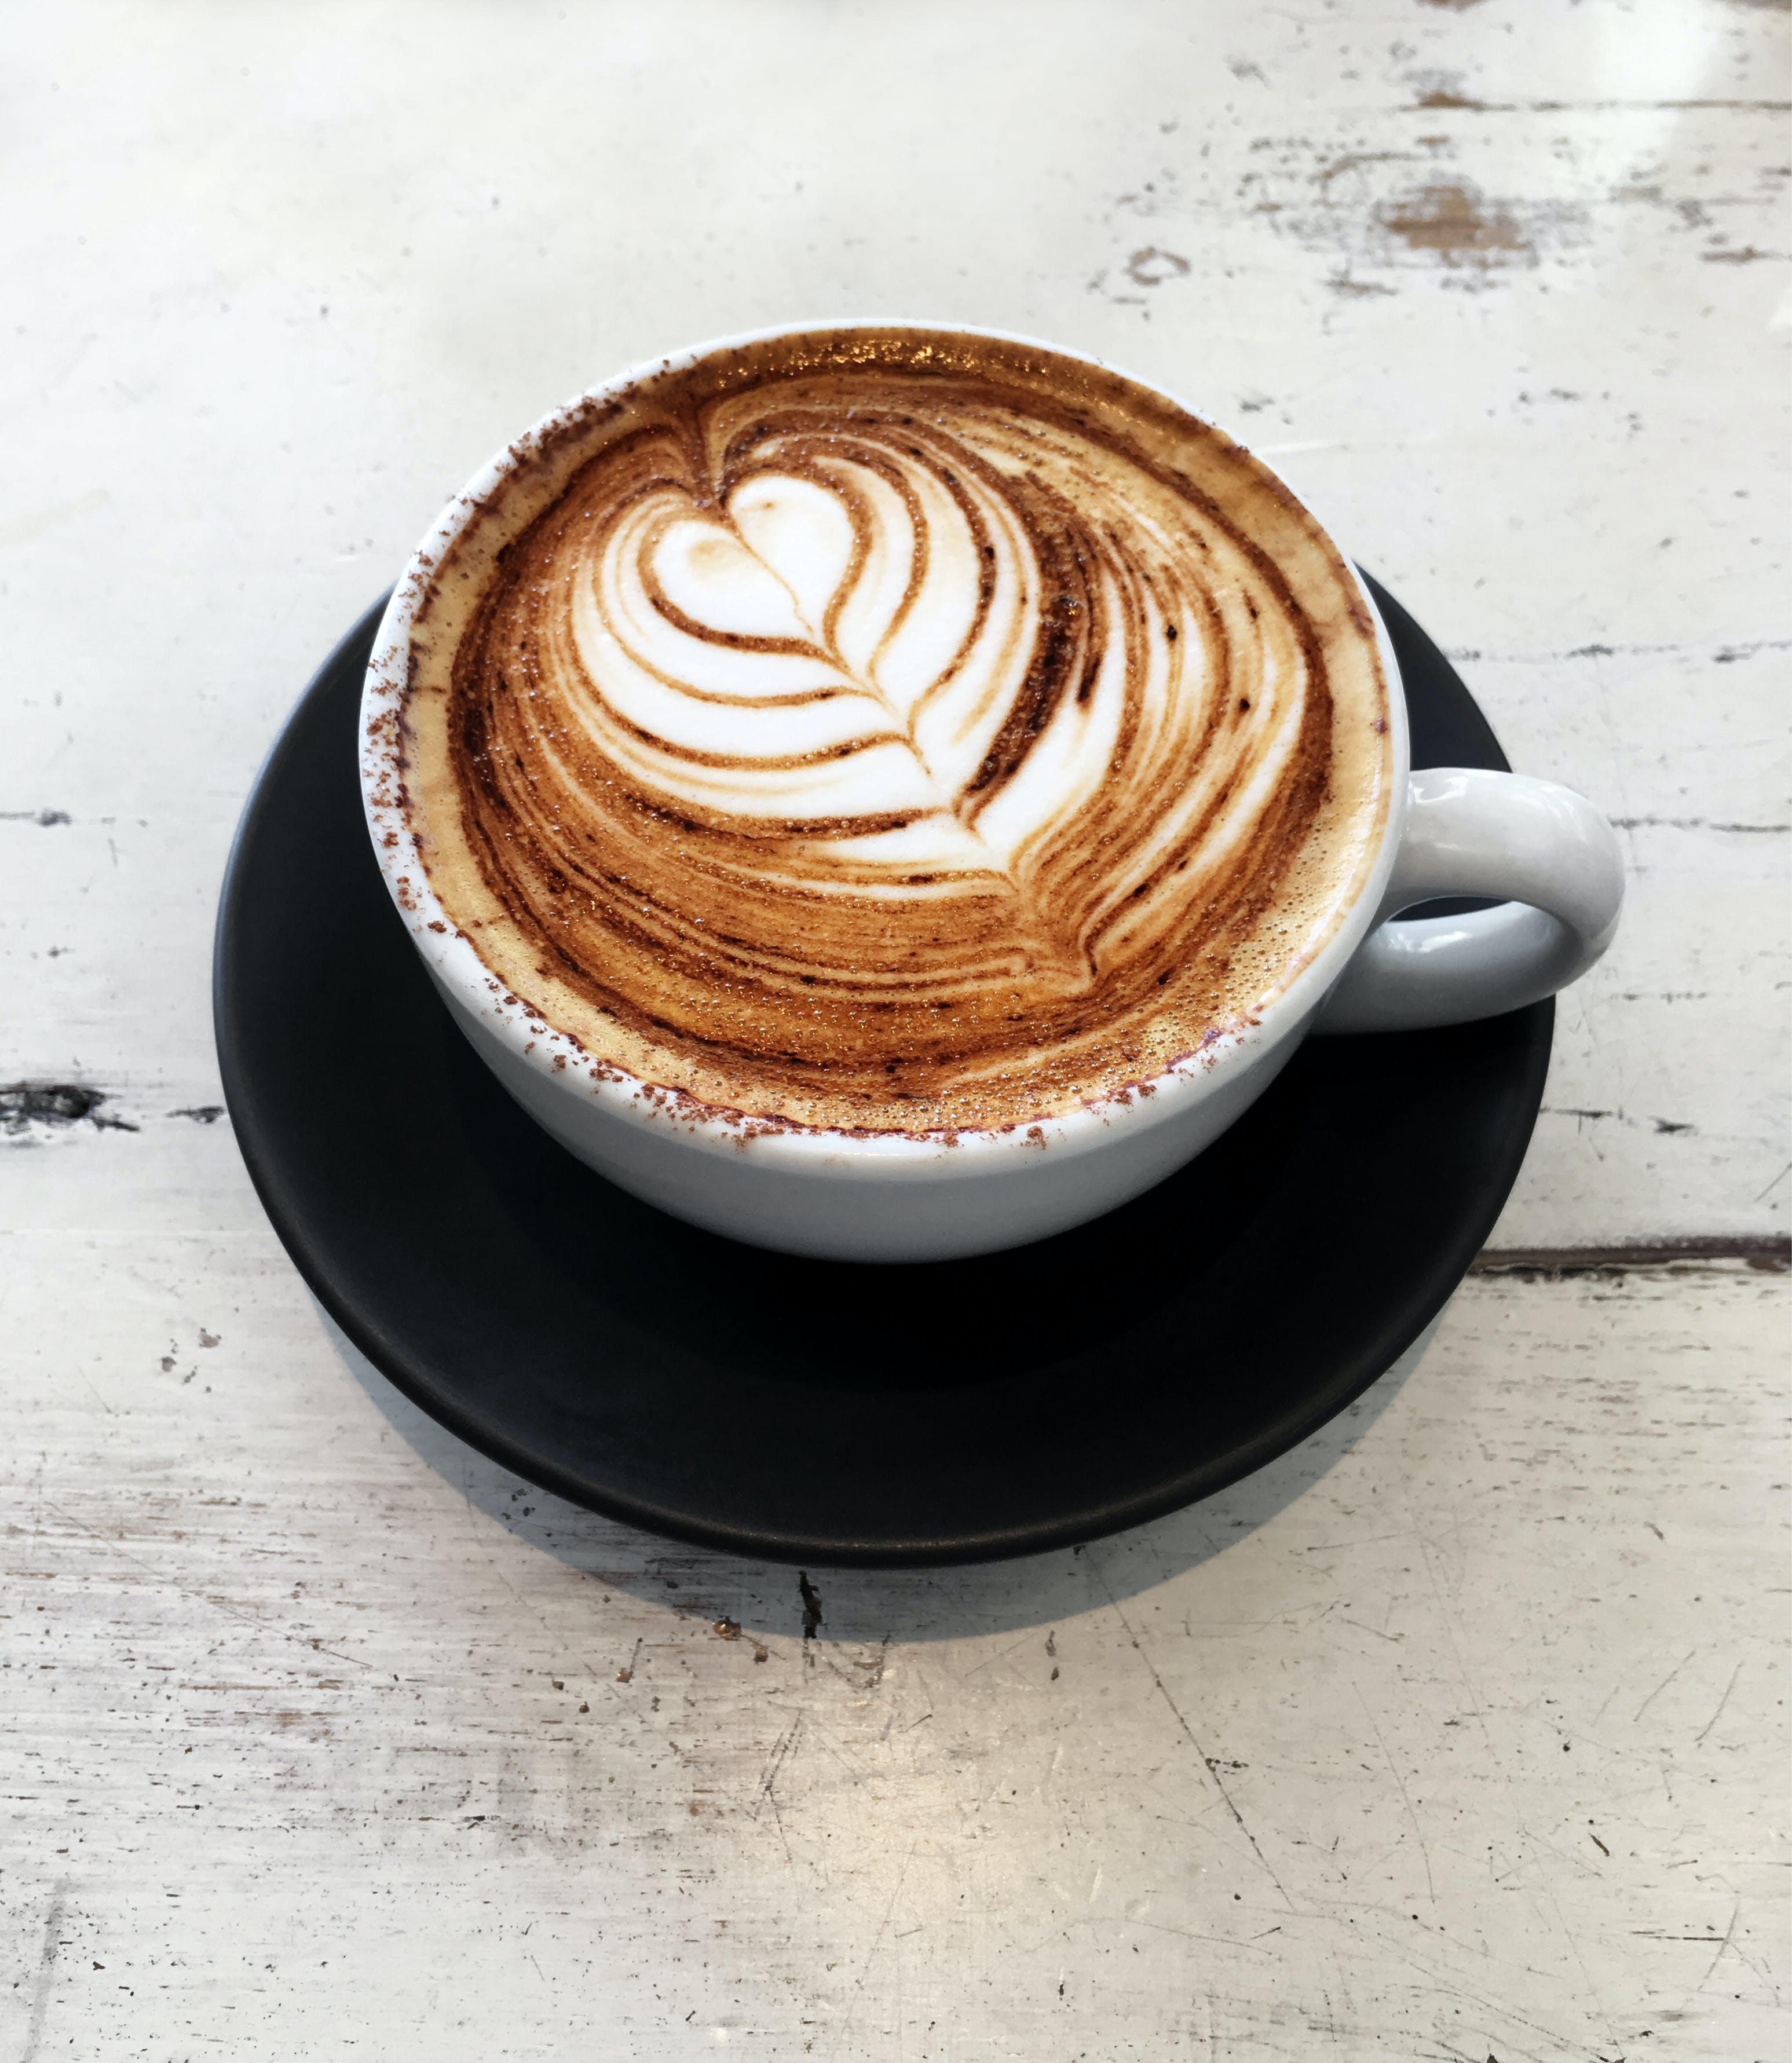 bechertisch, cappuccino, cremetasse